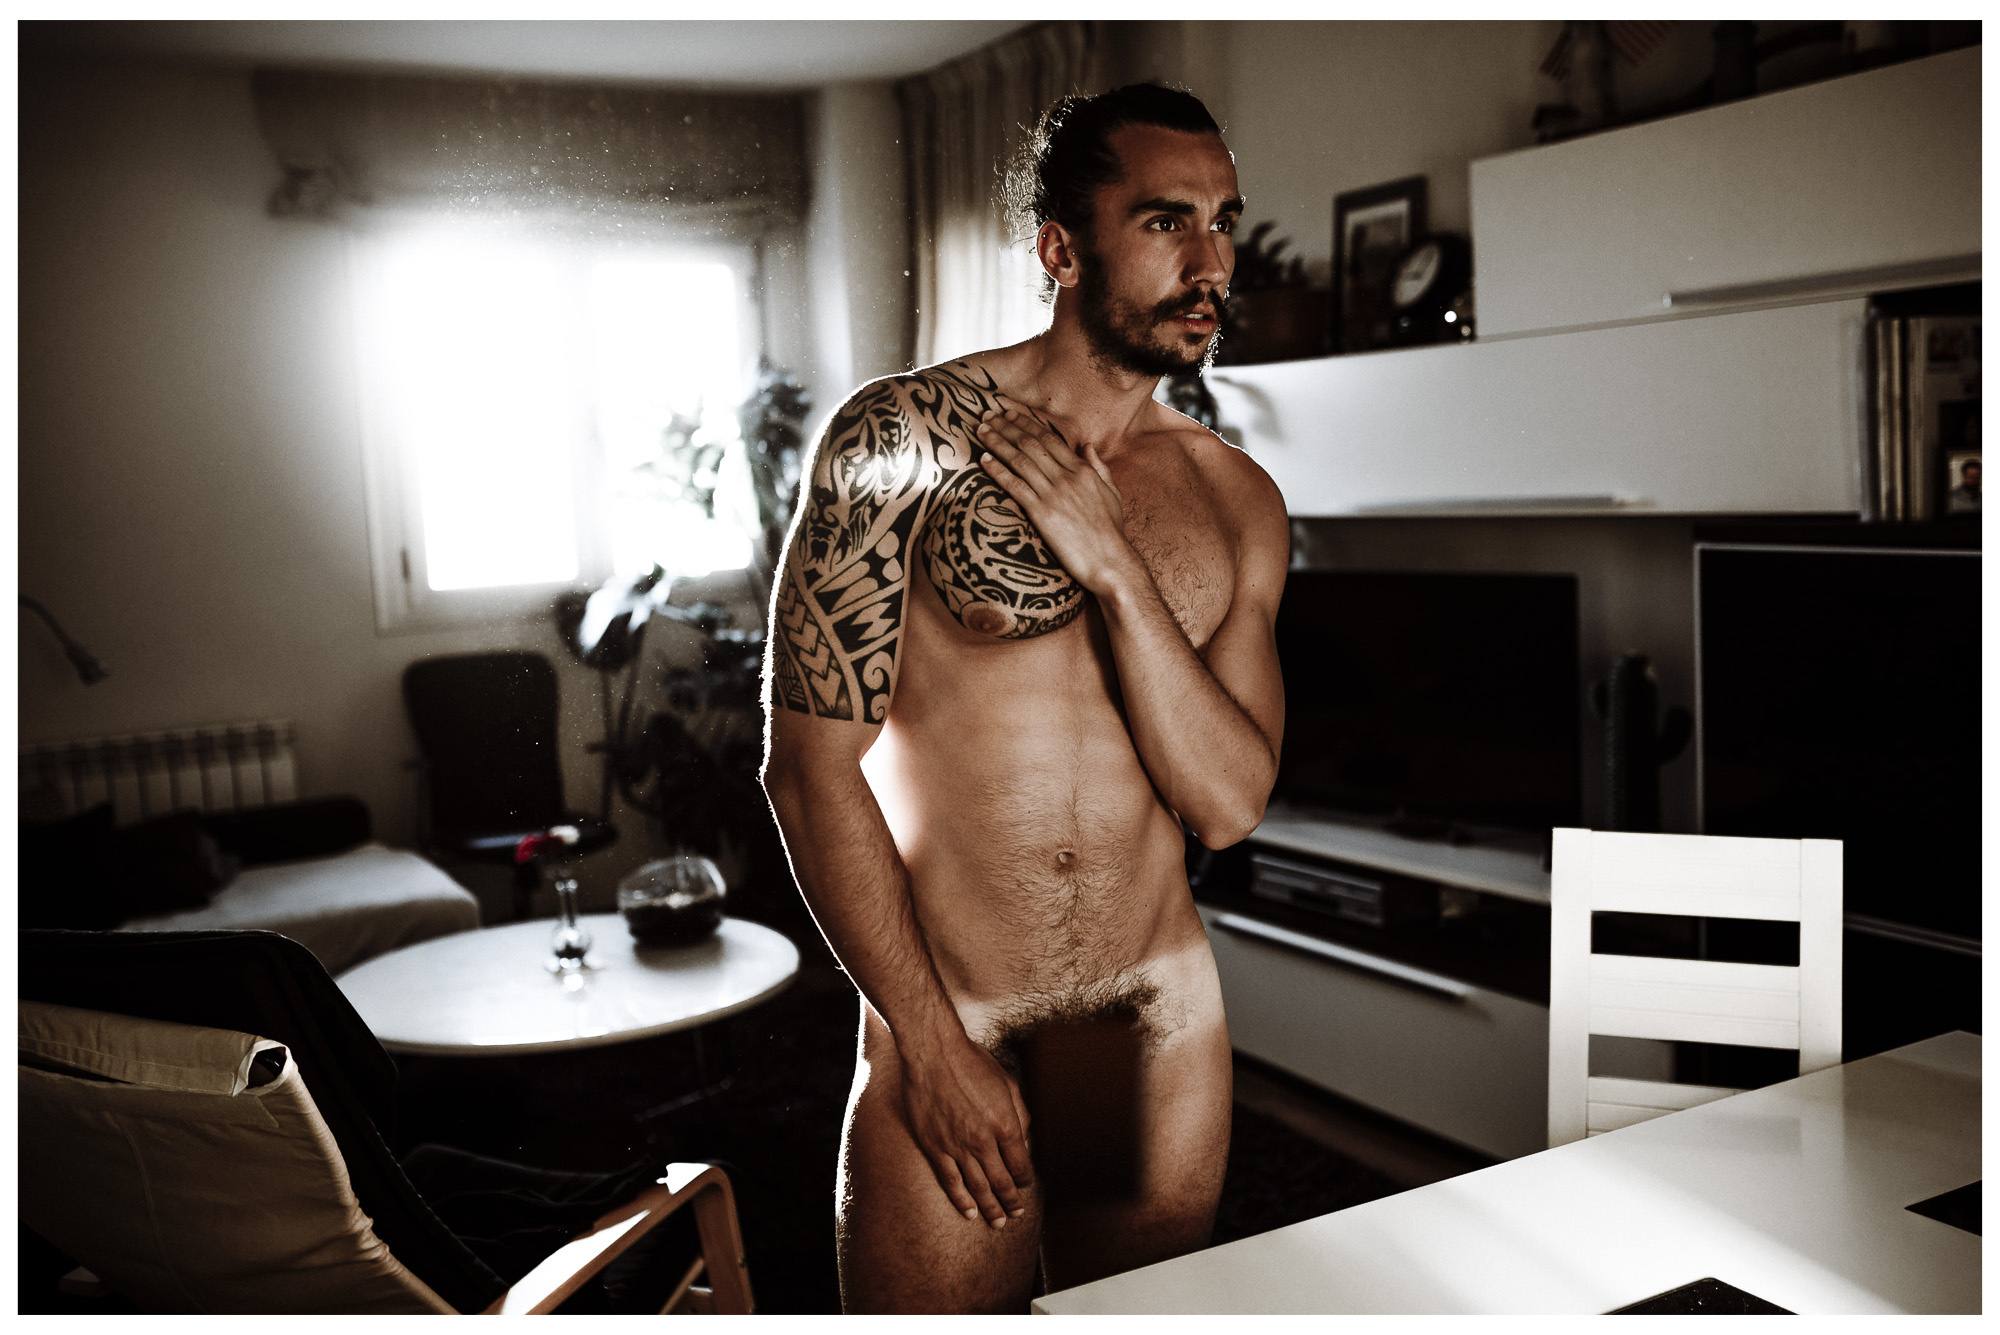 Desnudo - Jonathan-Joseangelfoto-216-1 censurasutil.jpg